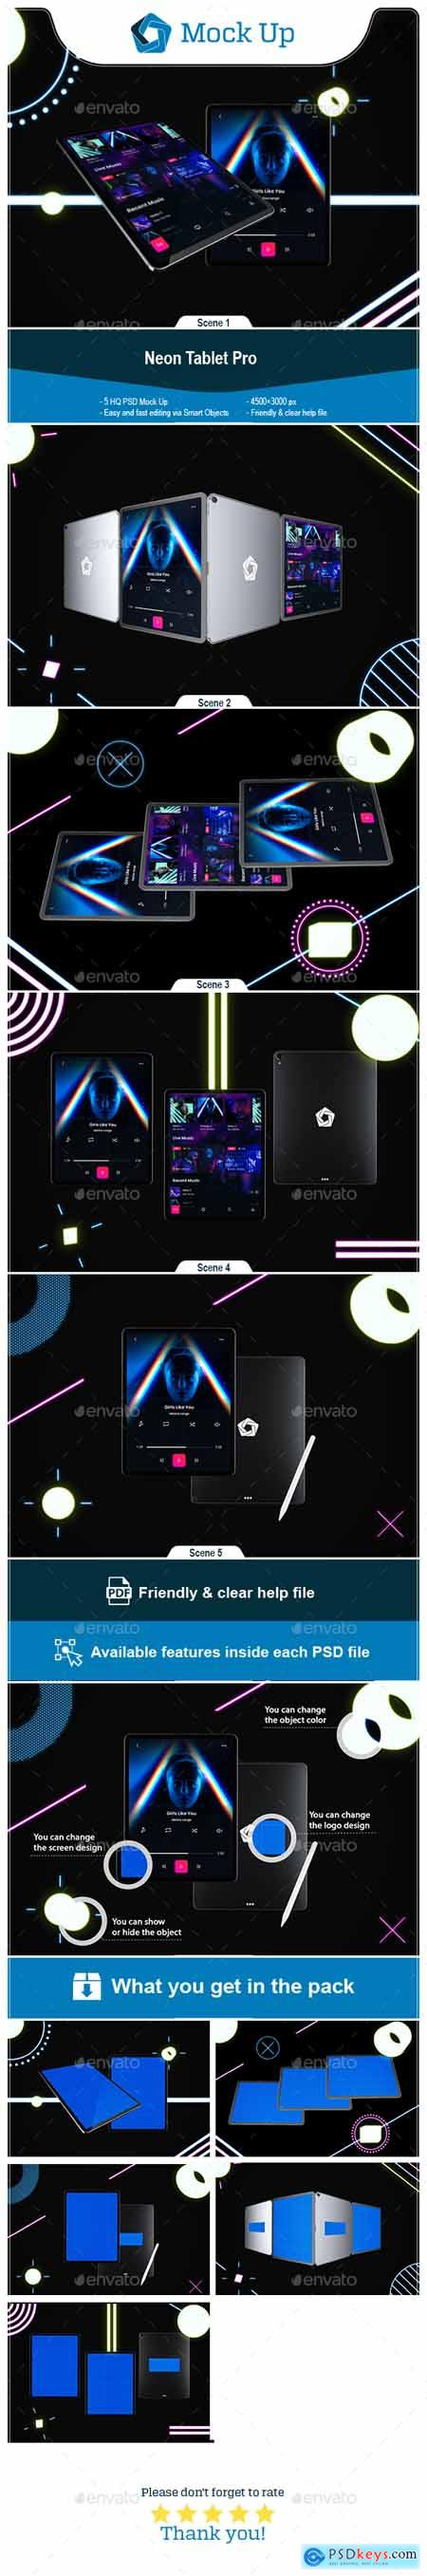 Neon Tablet Pro Mockup 24681306